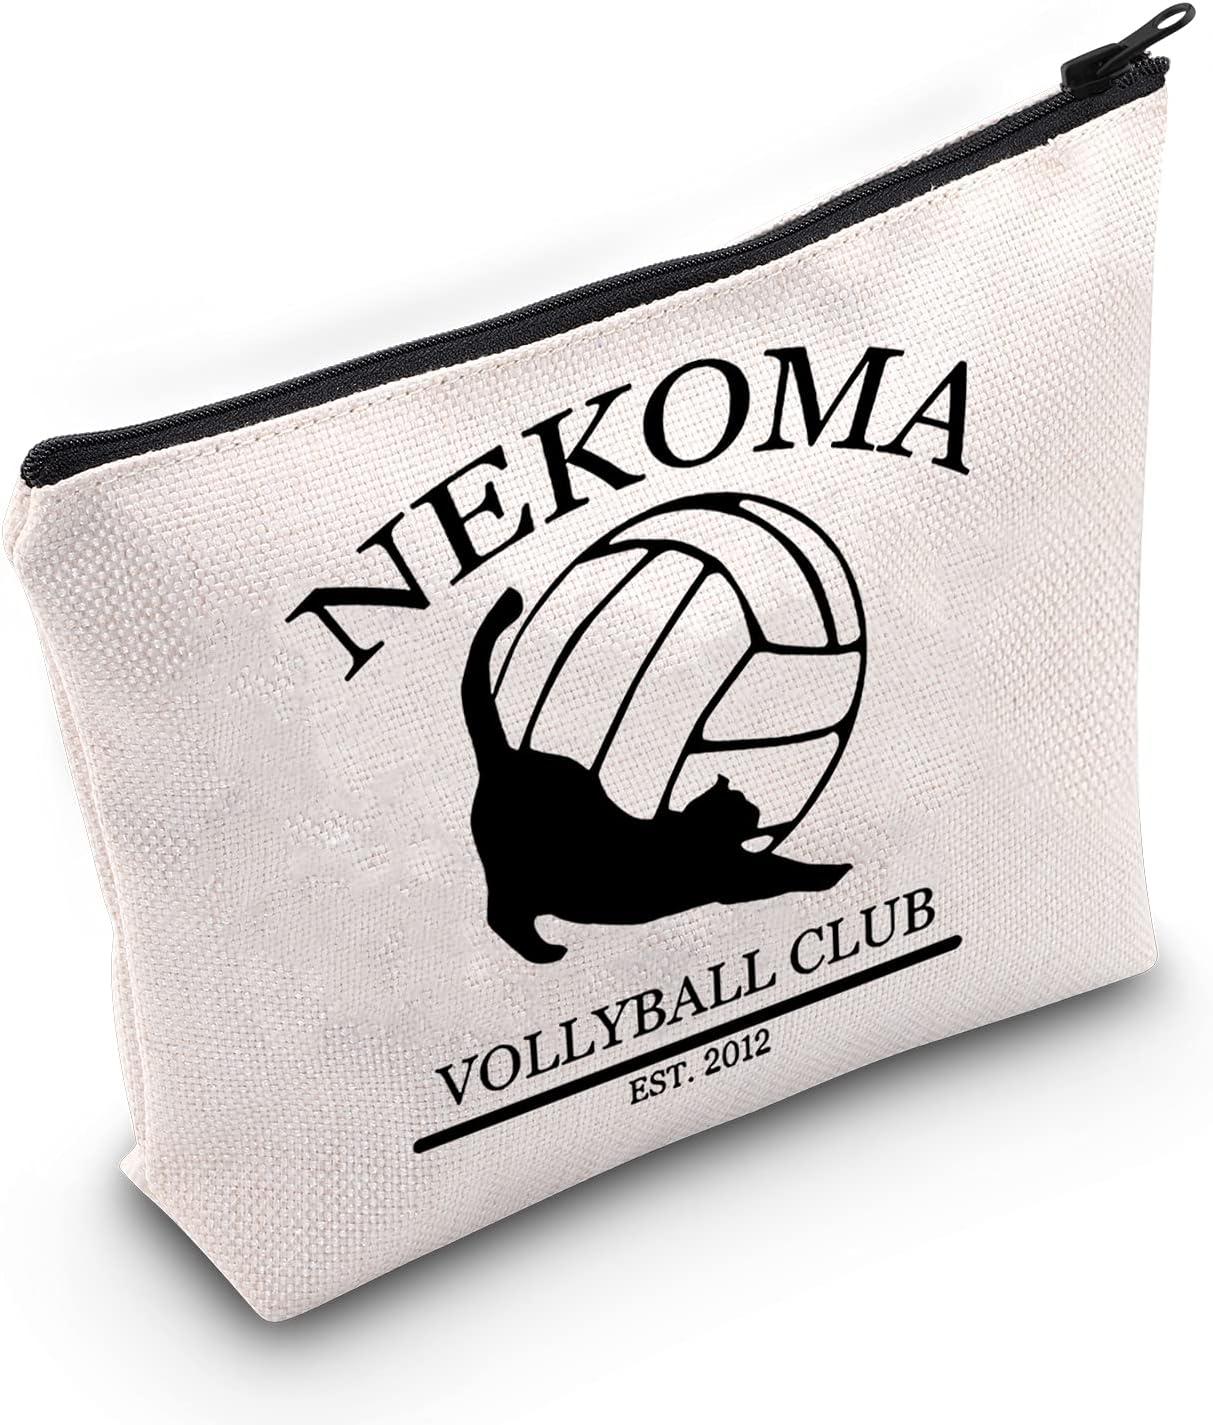 TOBGBE Haikyuu Gift Anime Lover Gift Karasuno Volleyball Club Makeup Bag Haikyuu Karasuno Gift Otaku Gift Battle At The Garbage Dump (Nekoma)